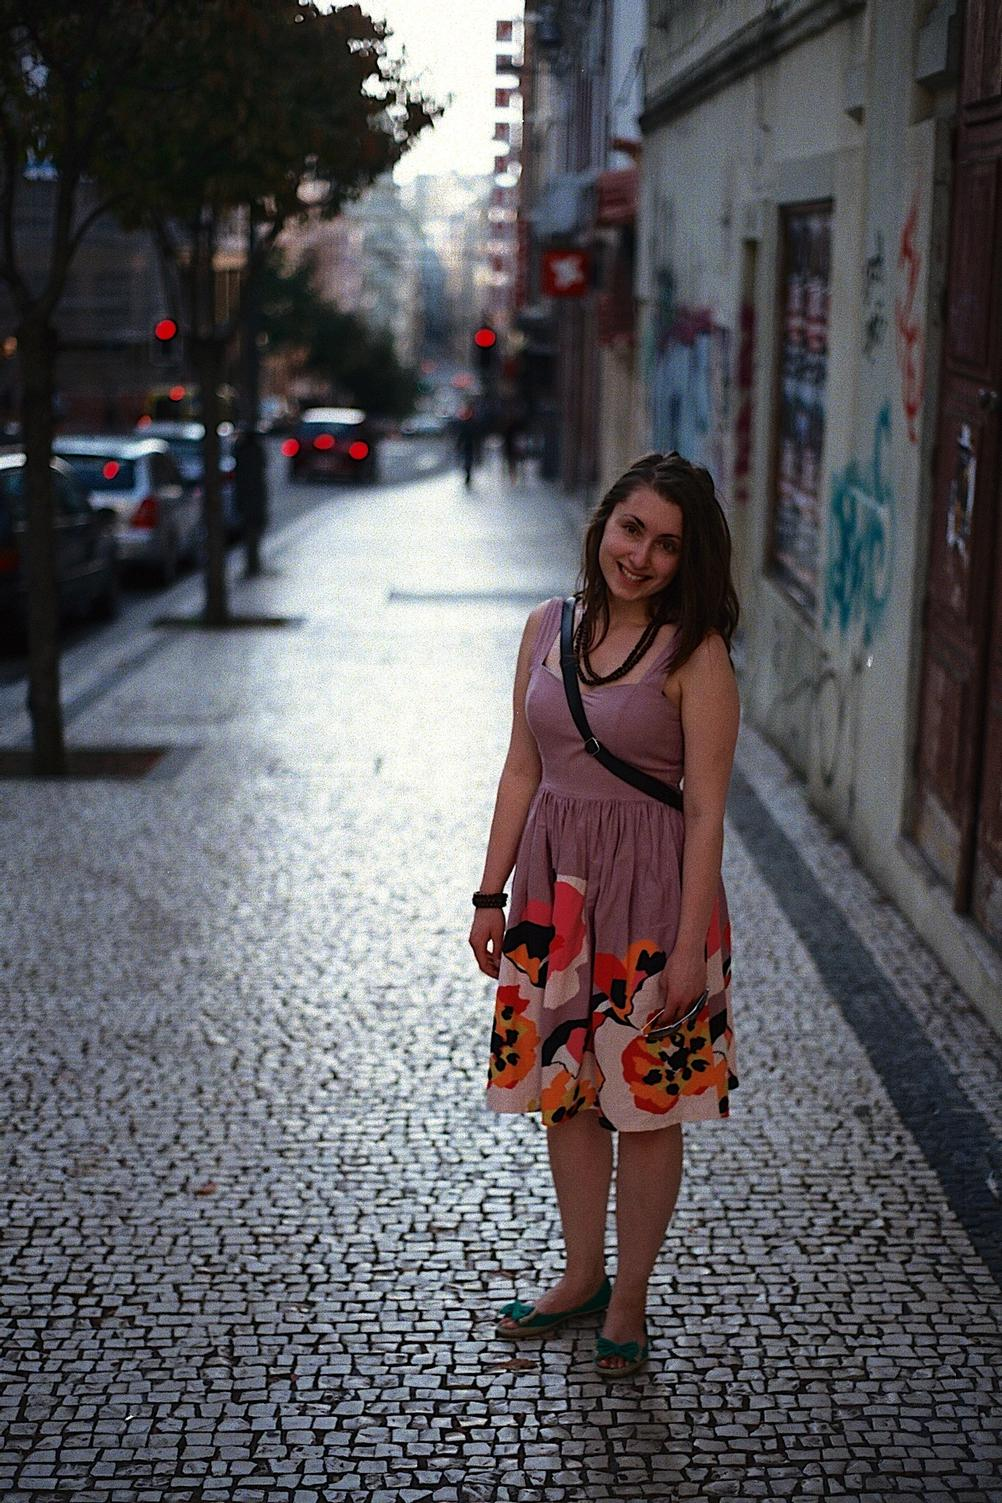 Shot of my wife taken in Portugal.